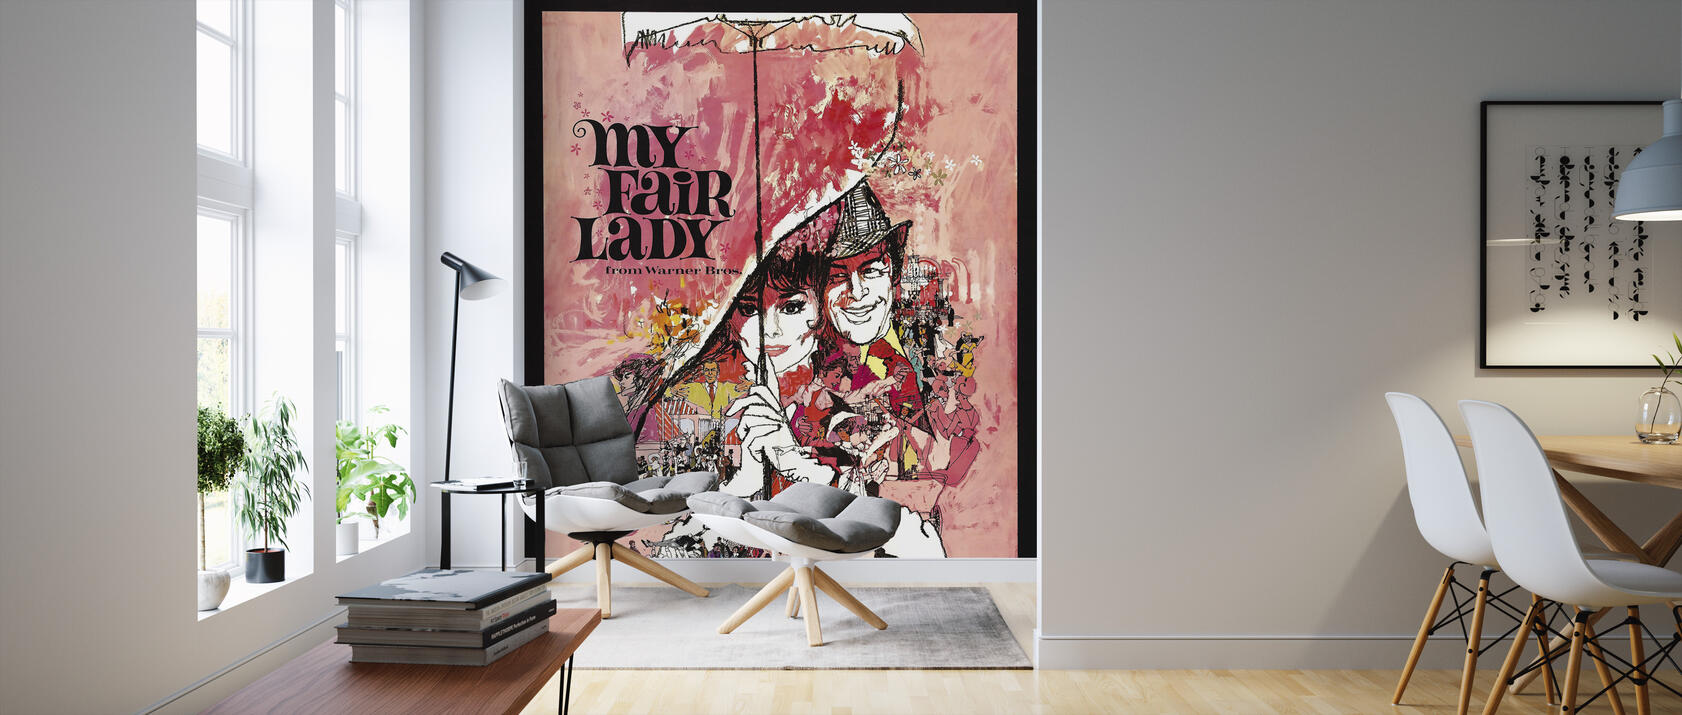 movie poster my fair lady fototapete nach ma photowall. Black Bedroom Furniture Sets. Home Design Ideas